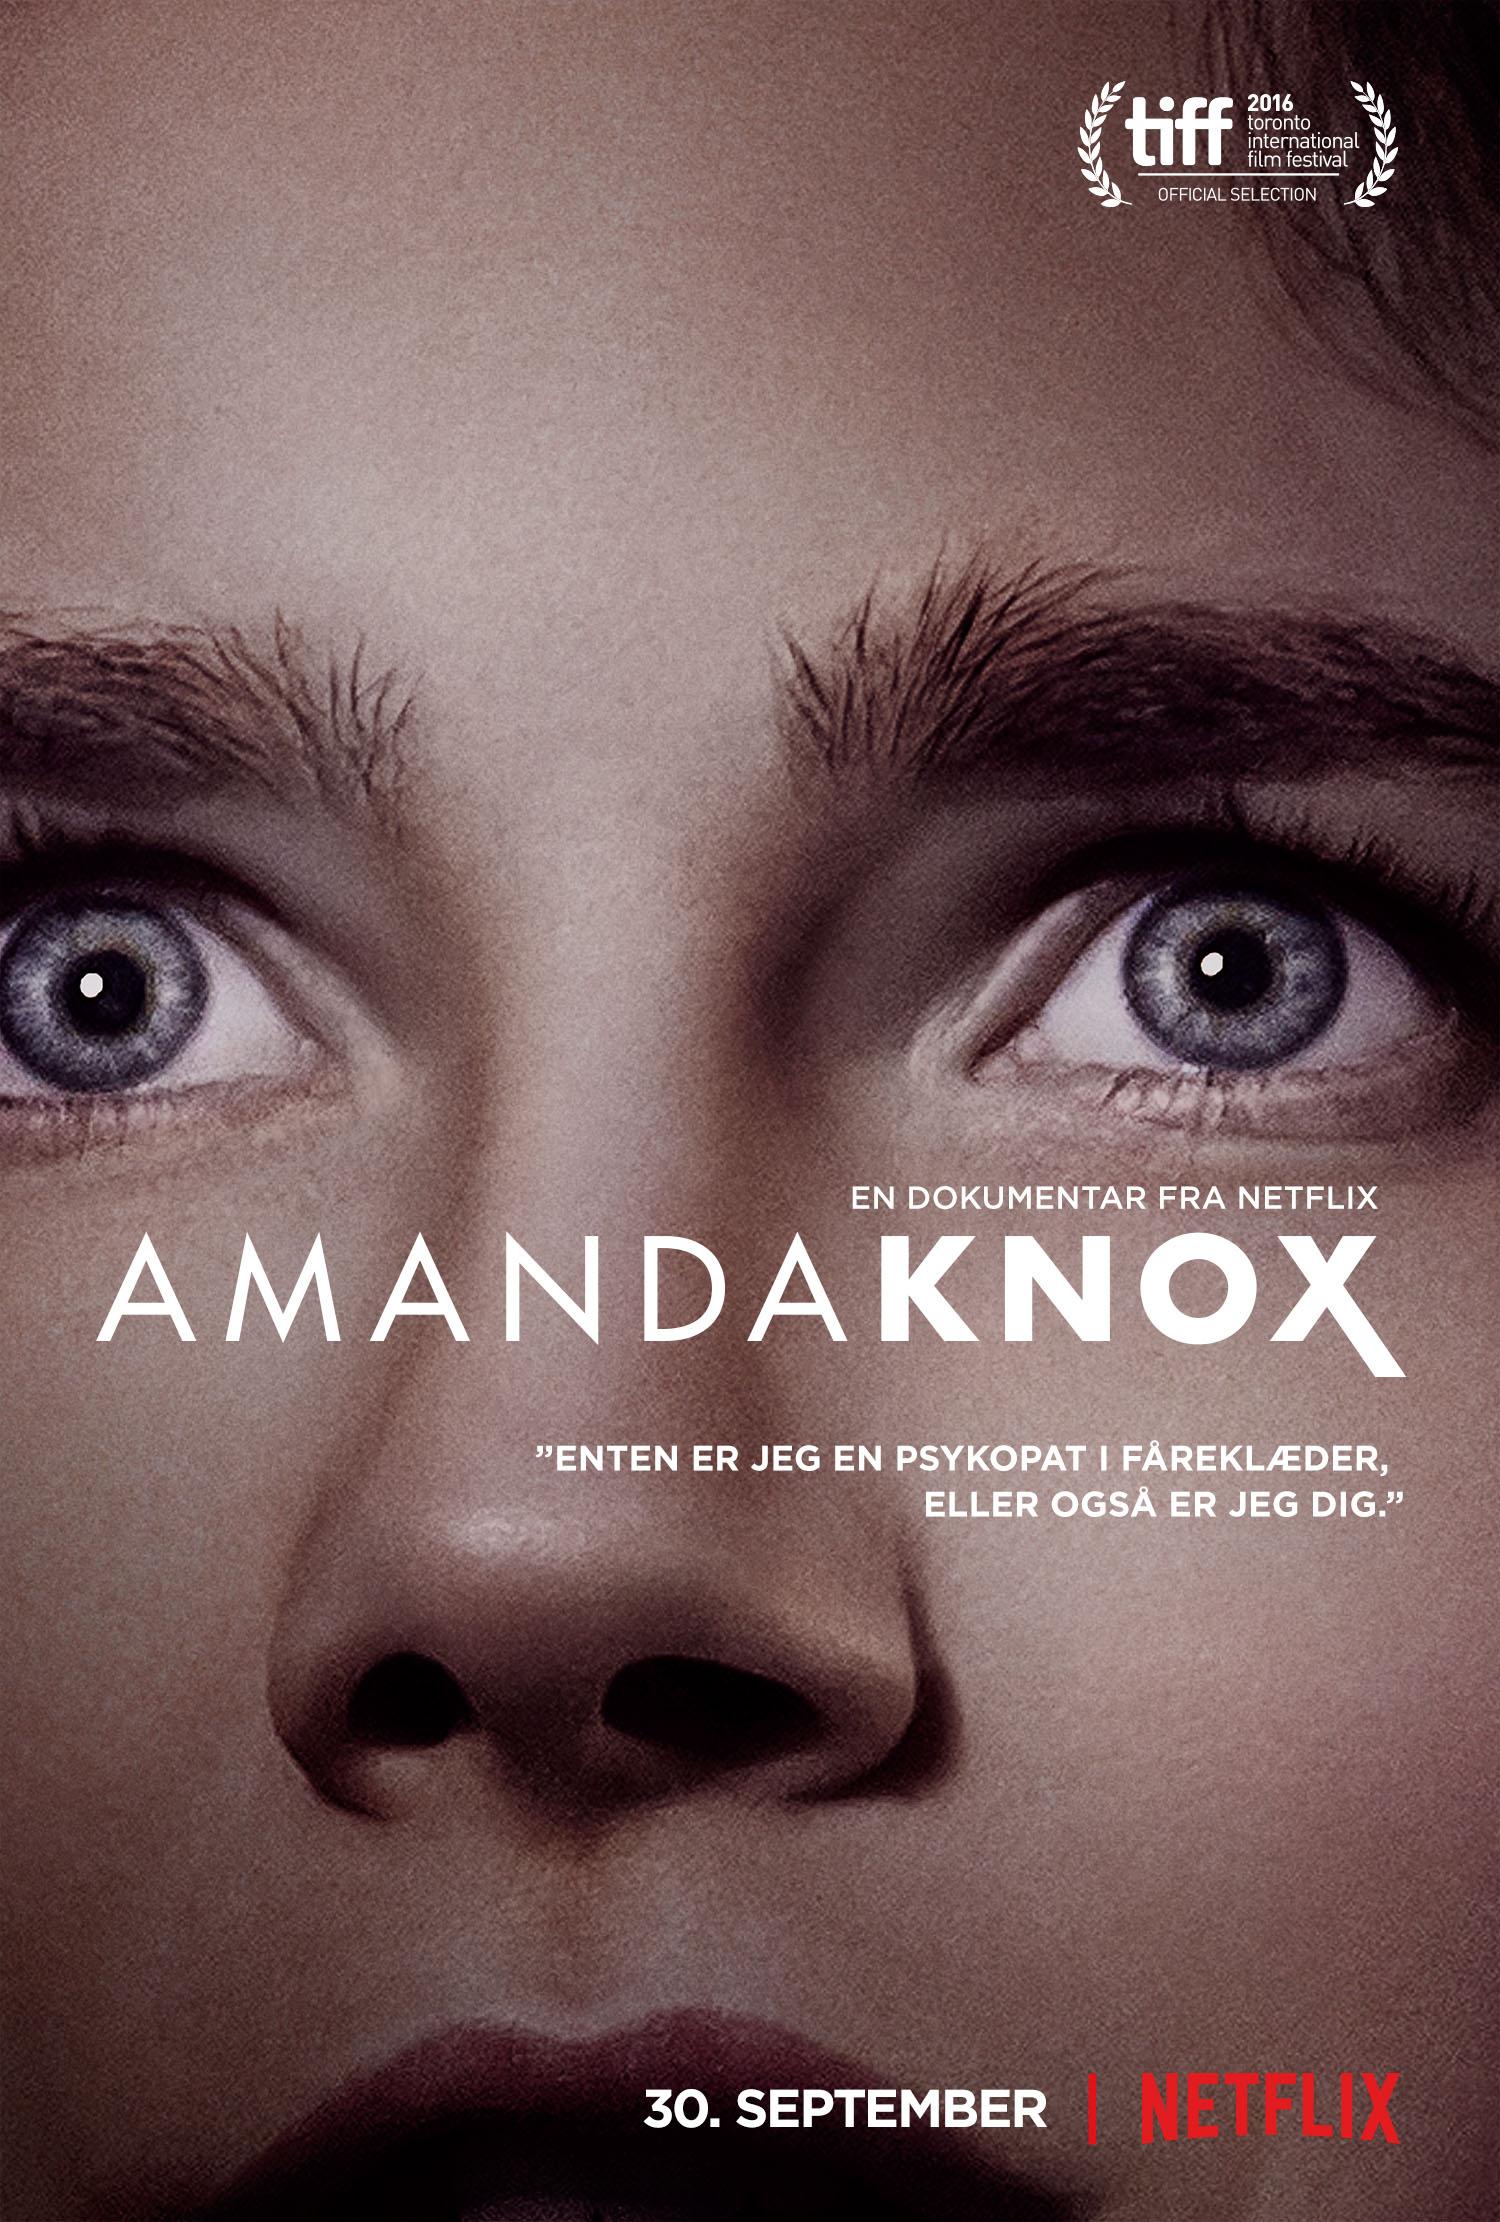 amanda-knox-netflix-danmark-dokumentar